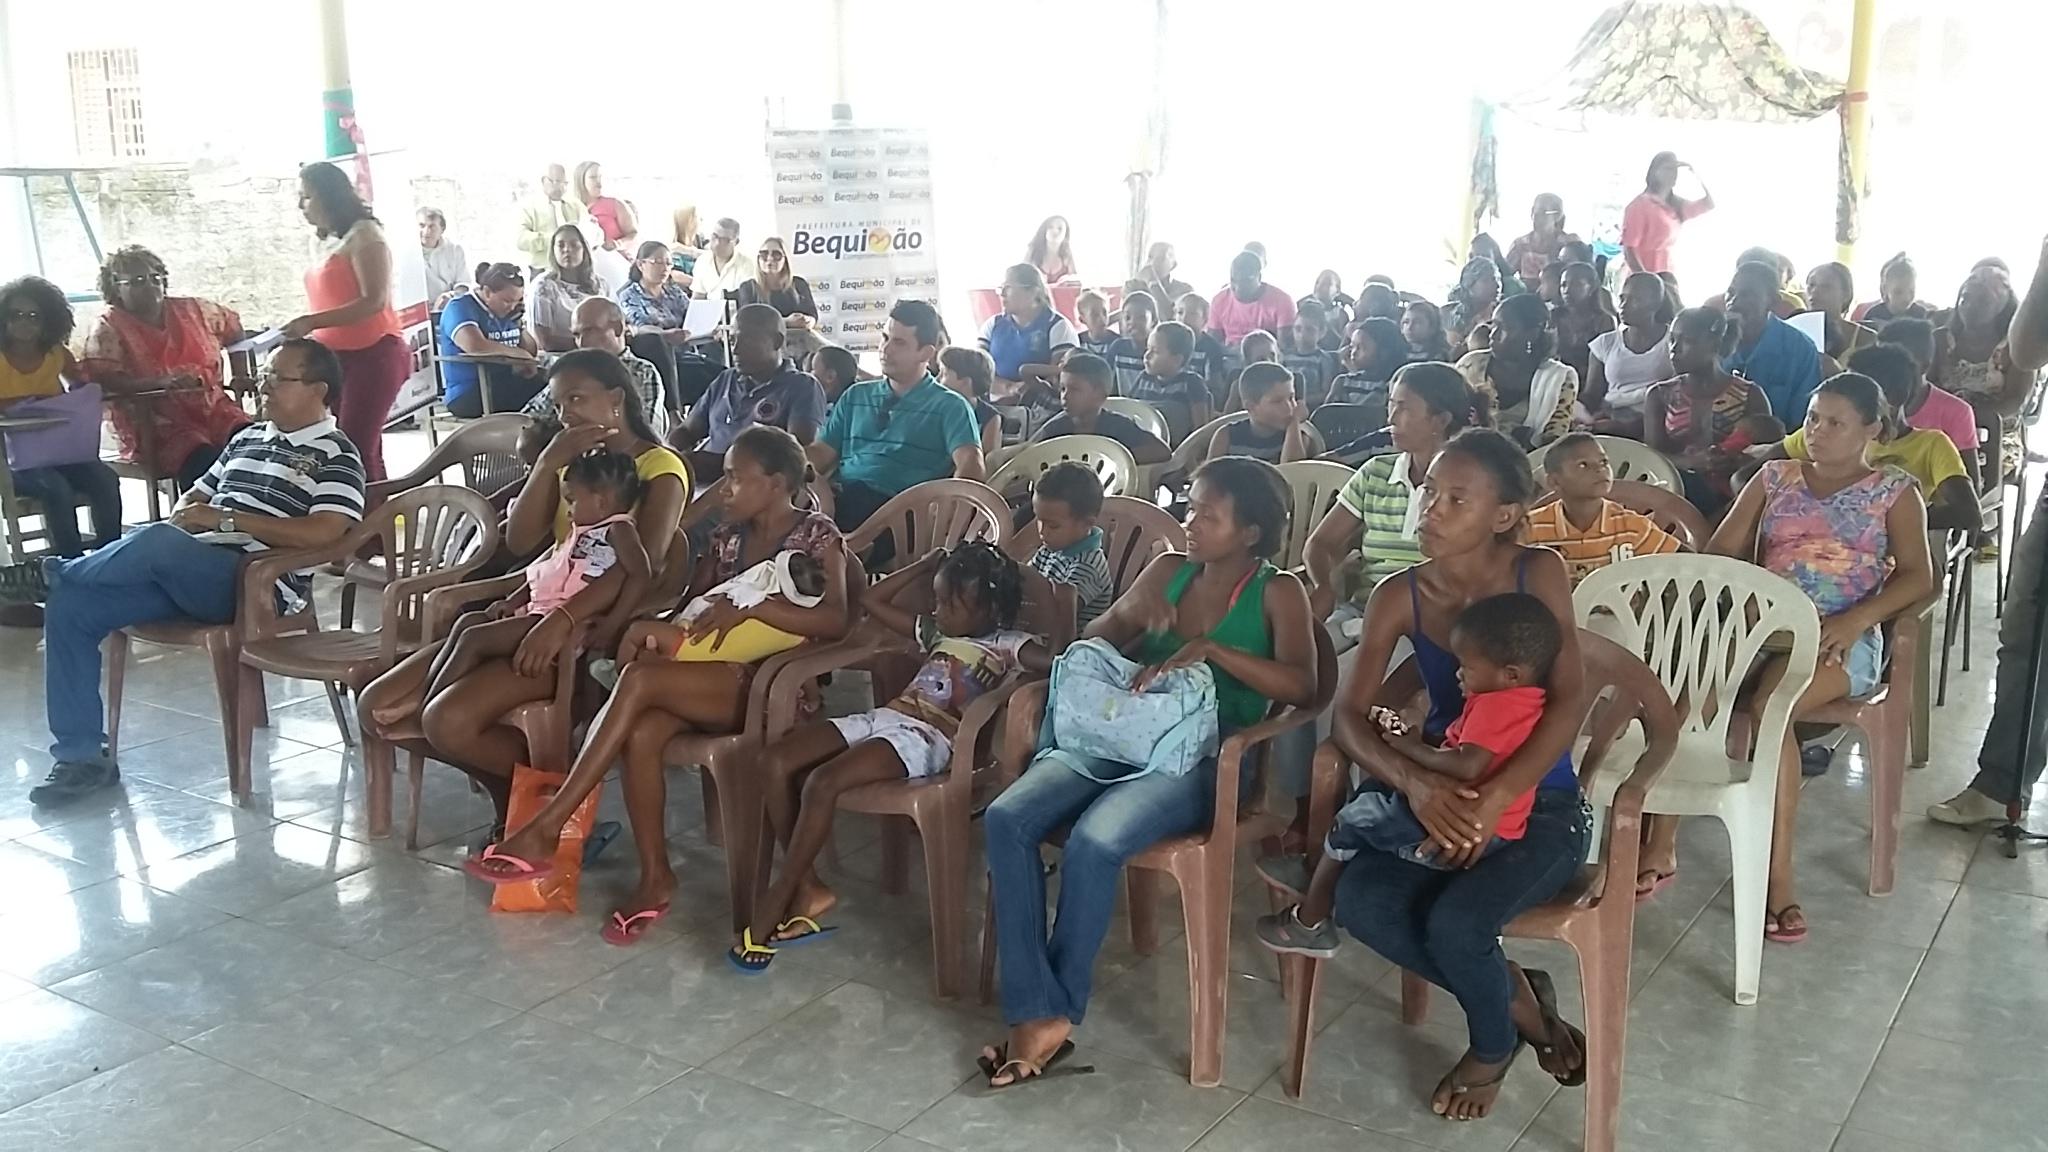 Foto 1 - Comunidades quilombolas presentes a Semana do Bebê Quilombola